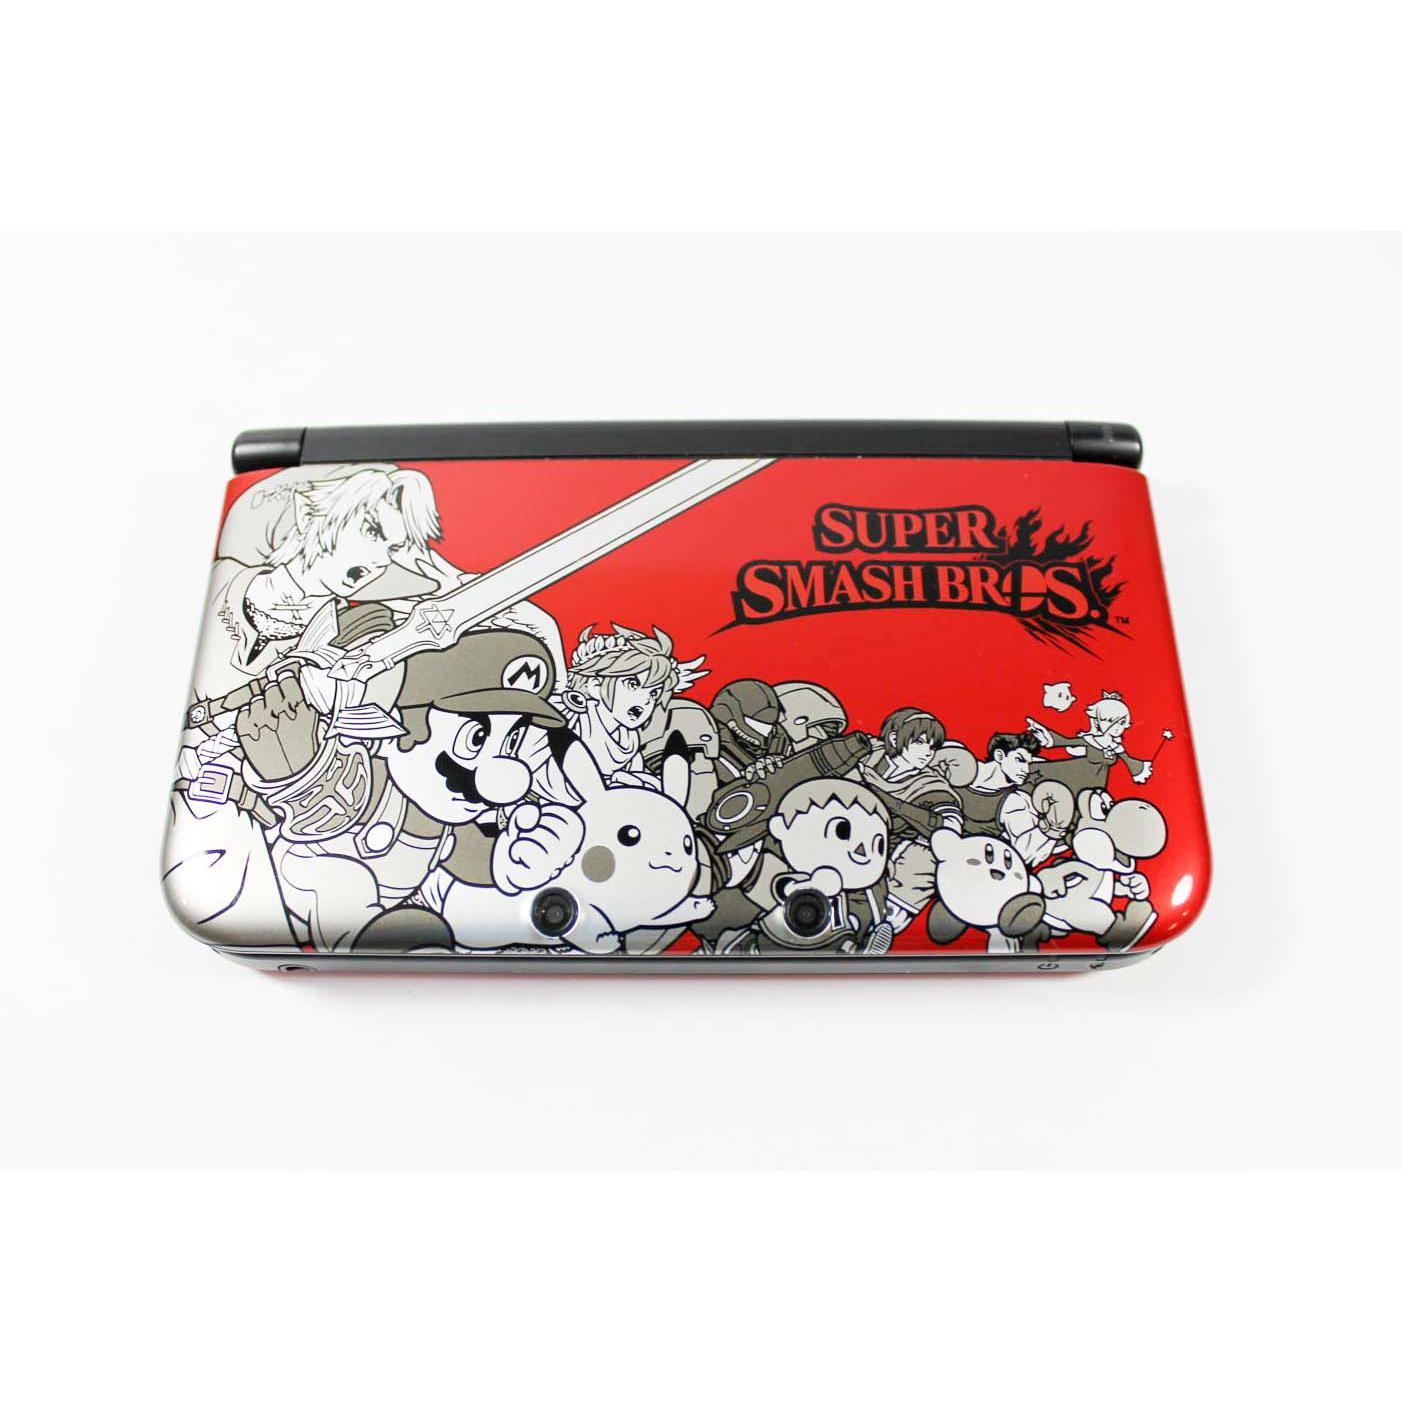 Gameconsole Nintendo 3DS XL + Super Smash Bros Limited Edition